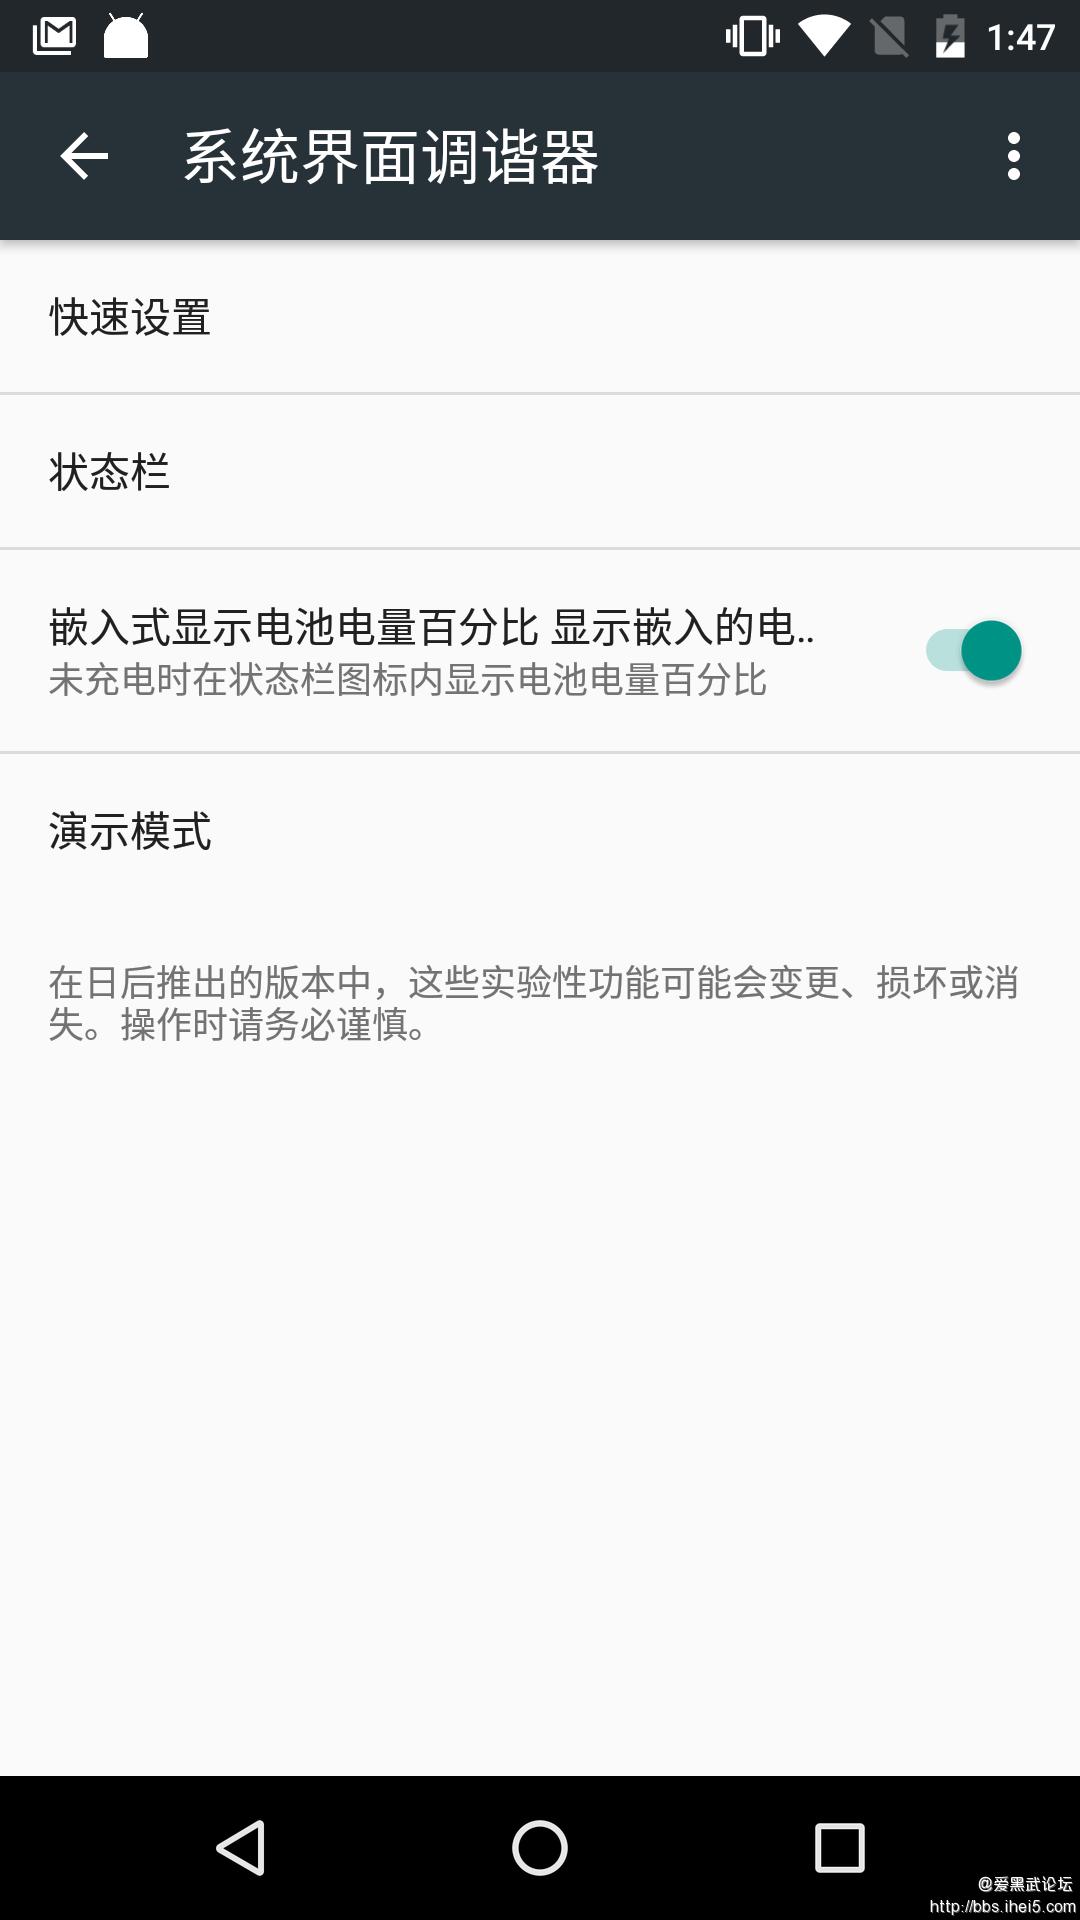 Screenshot_20151204-014703.png